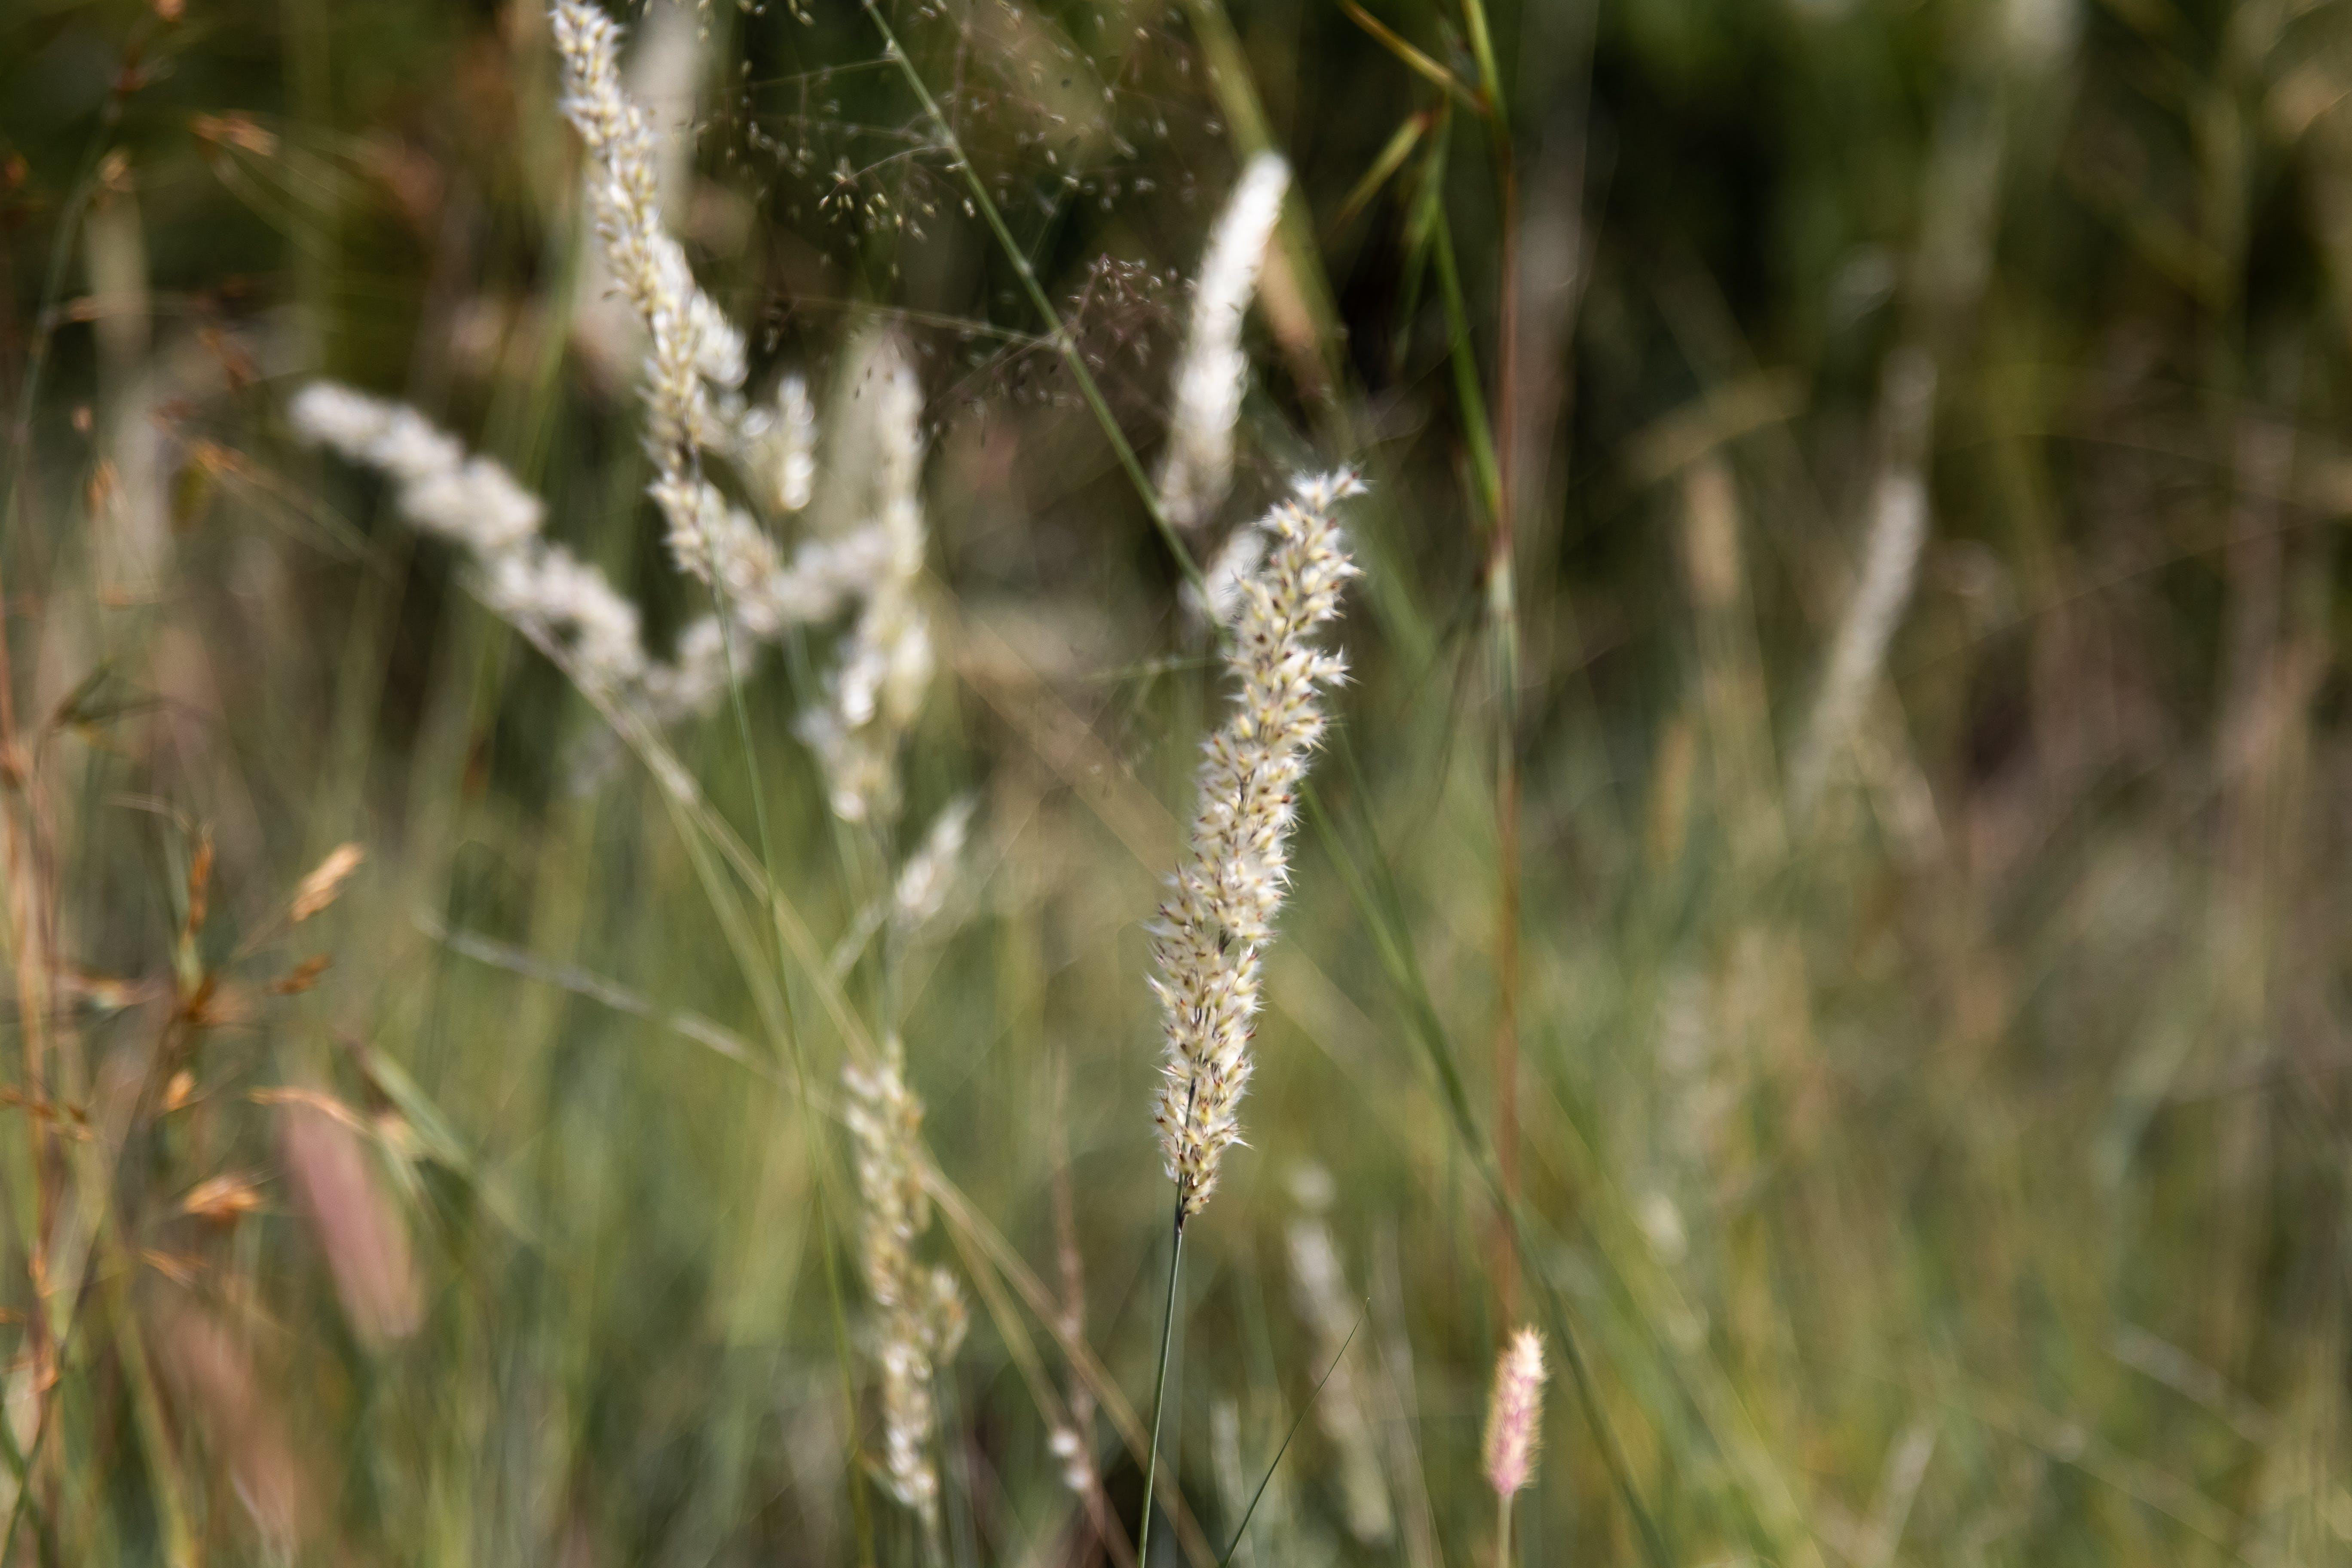 of background, bush, grass, nature